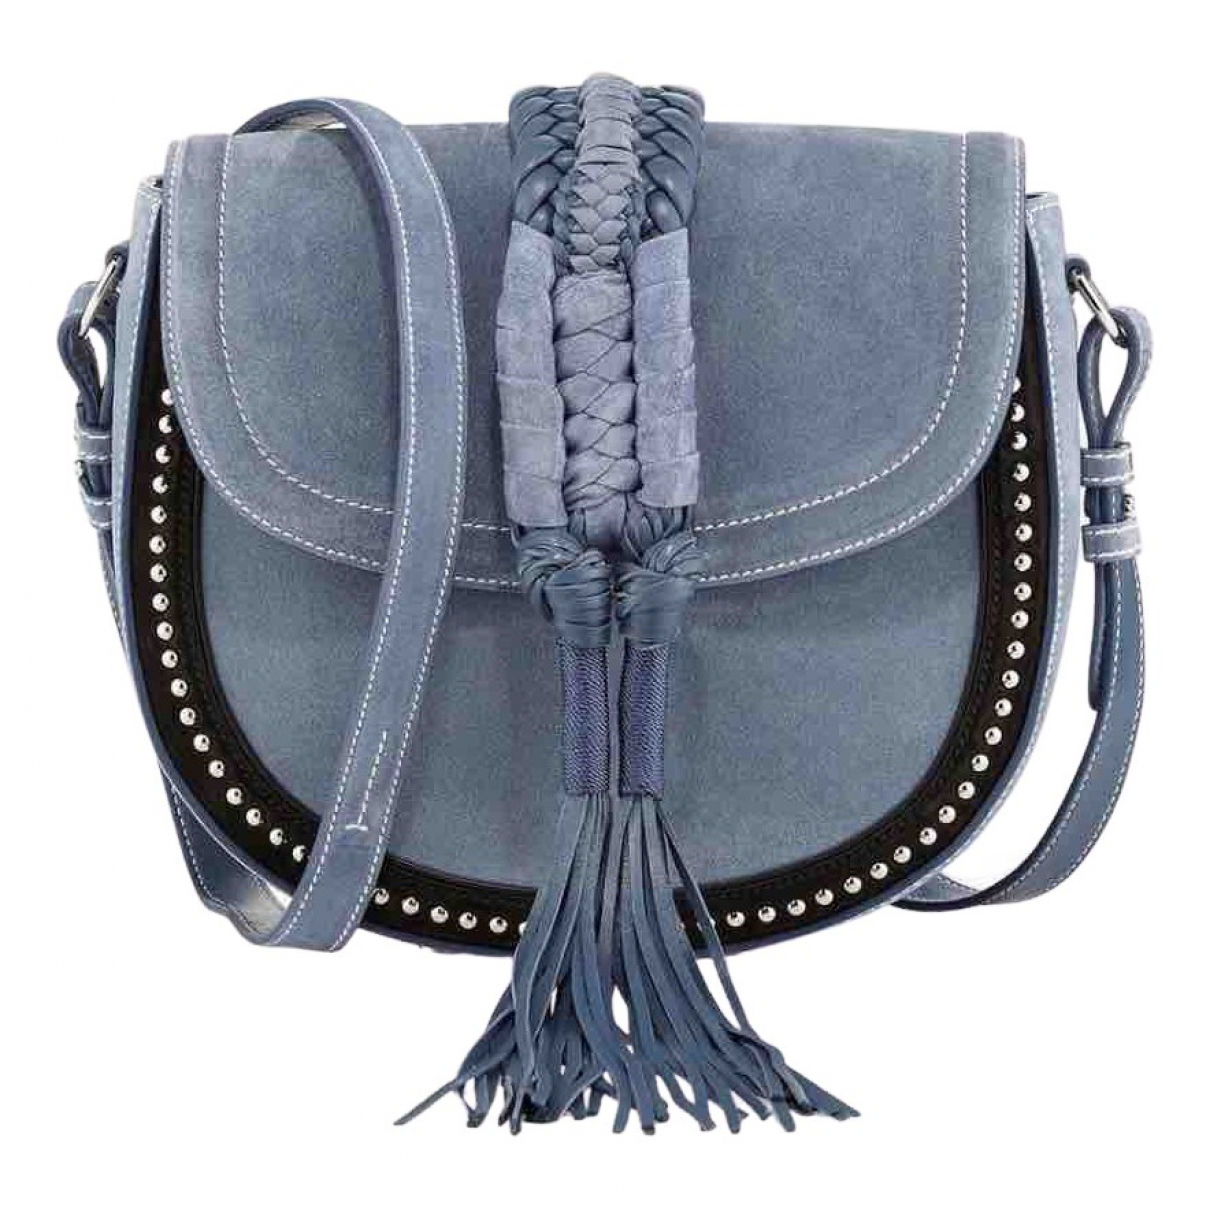 Altuzarra \N Blue Suede handbag for Women \N